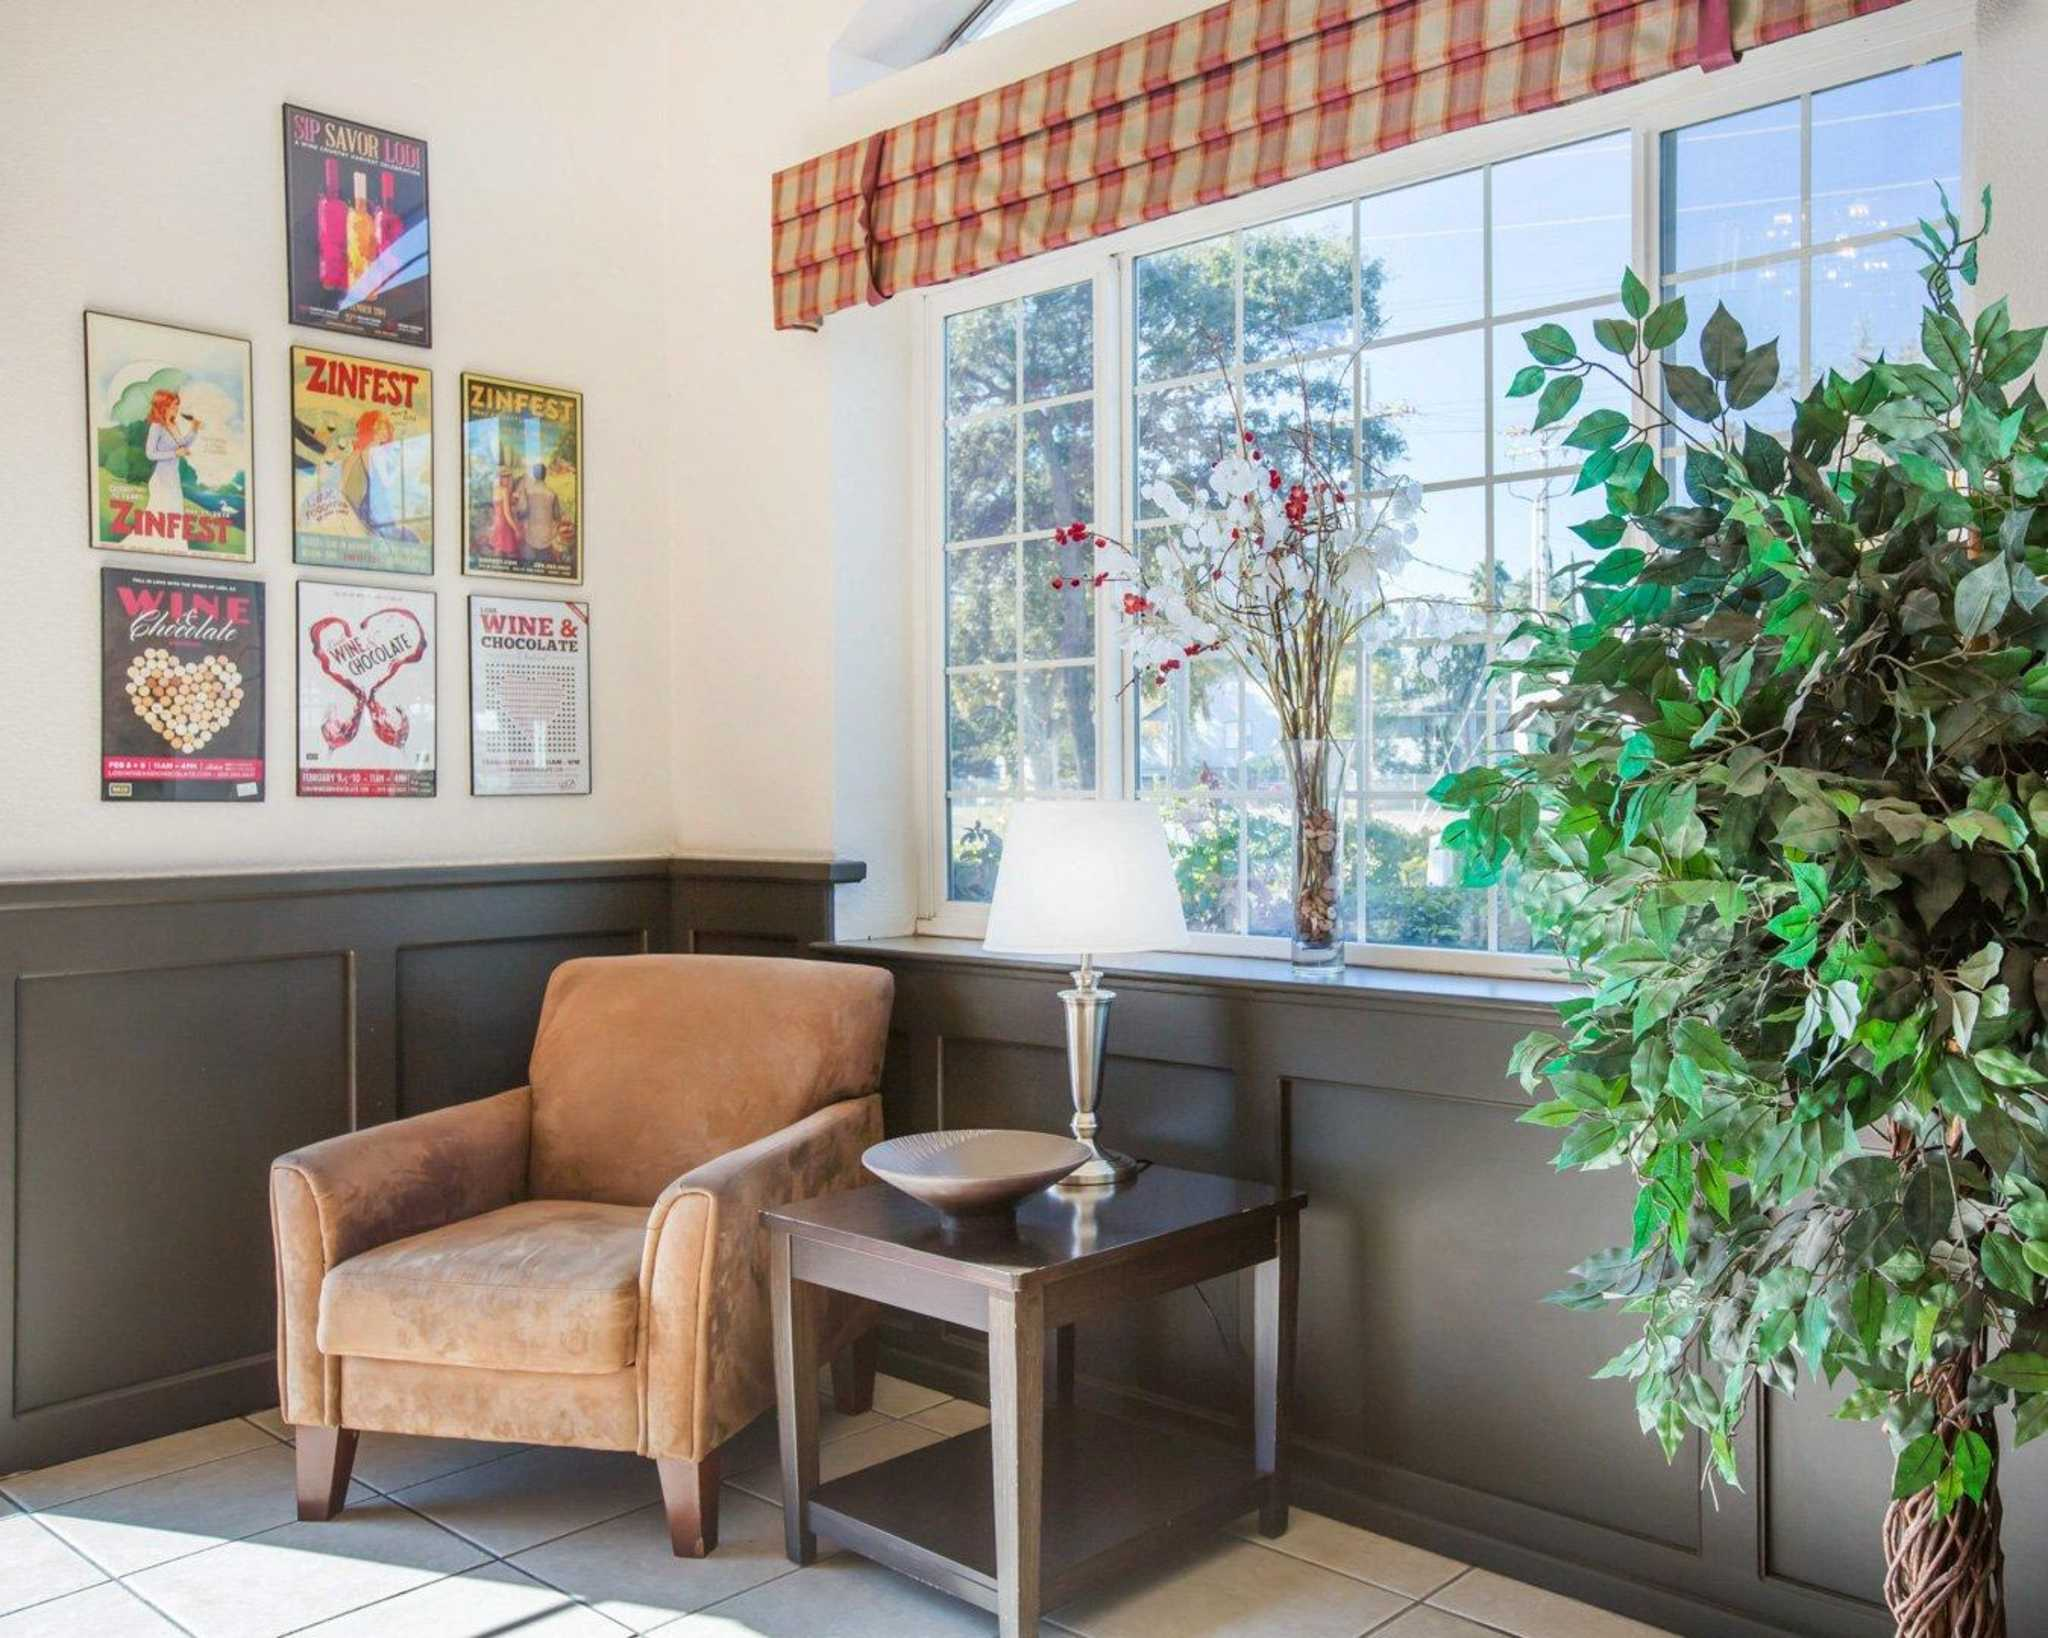 Econo Lodge Inn & Suites Lodi image 7